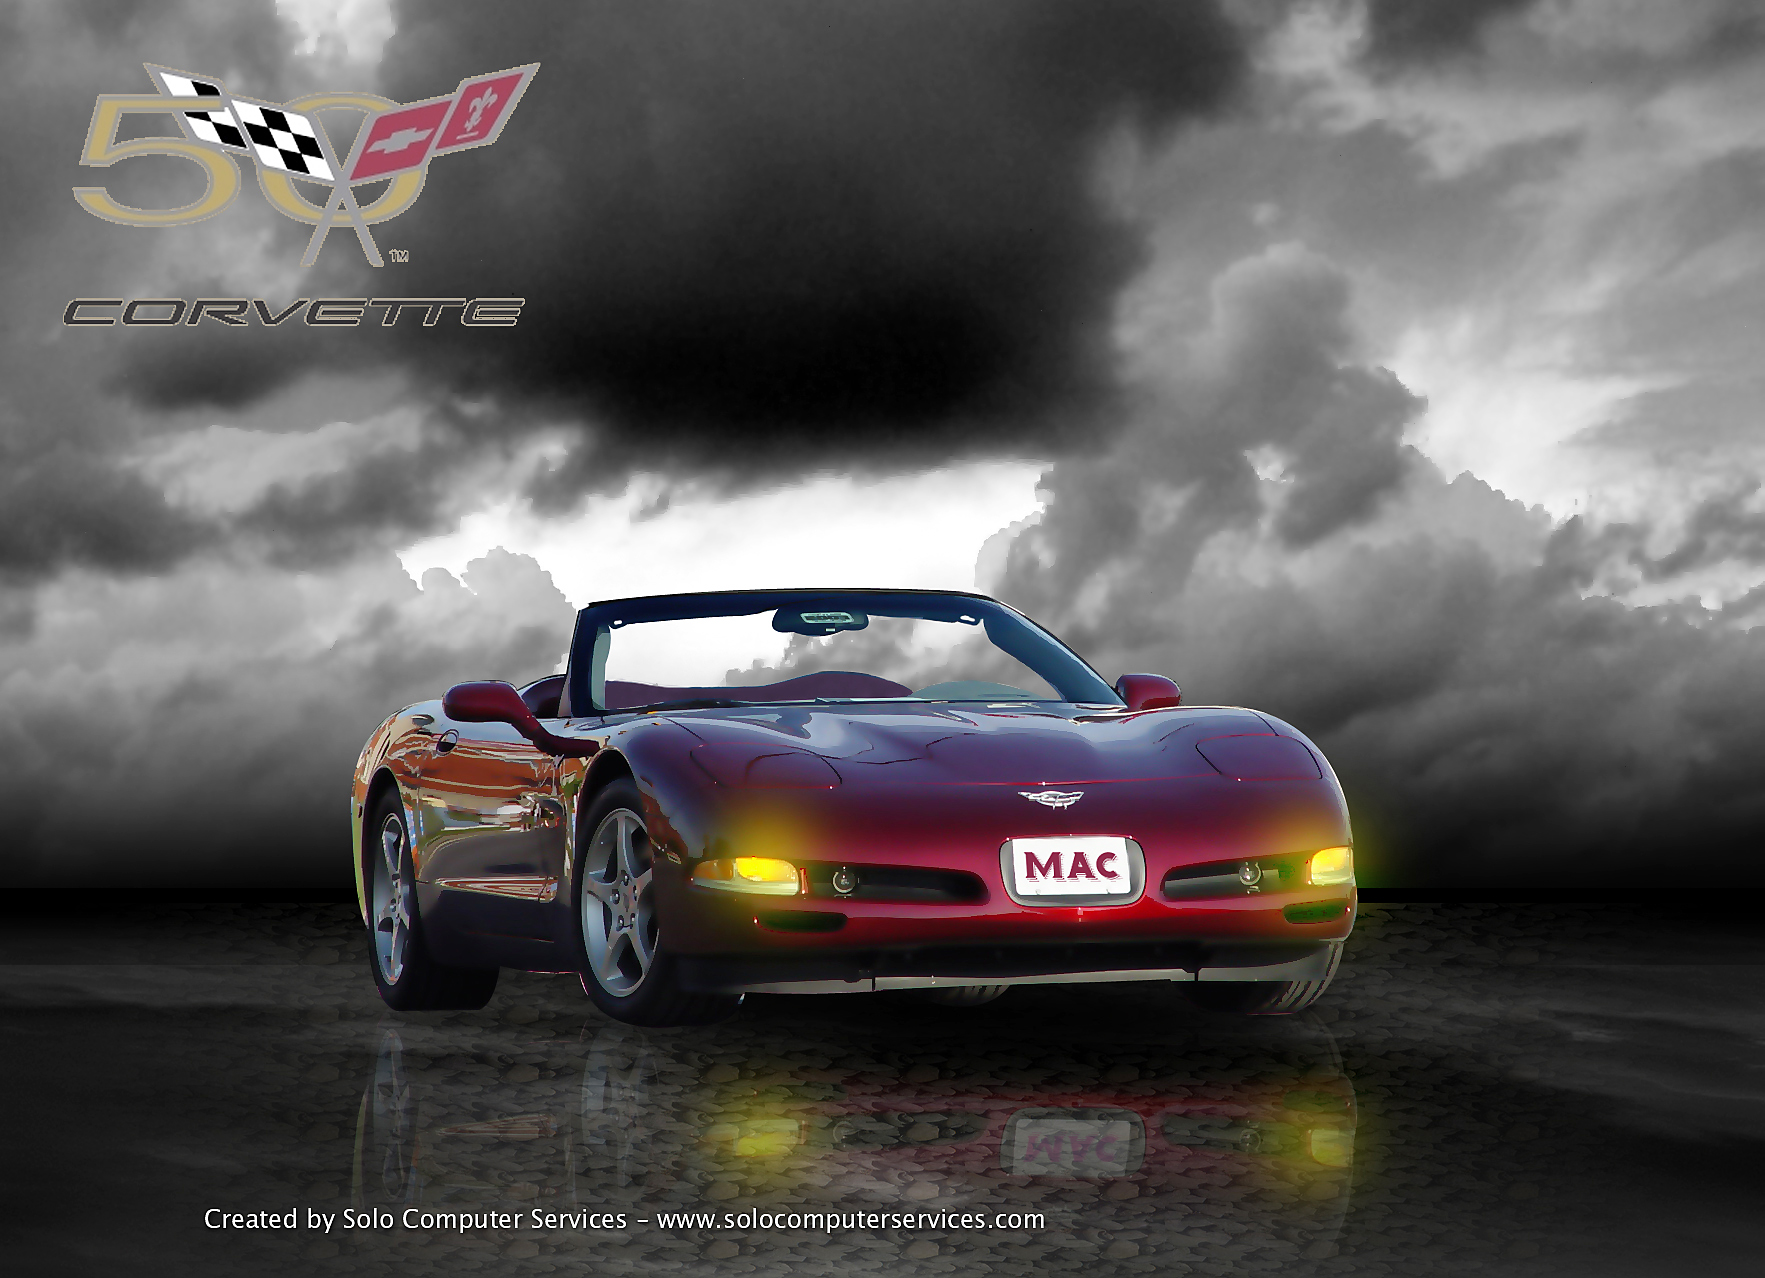 Corvette HD Desktop Wallpapers Hd Wallpapers 1765x1278